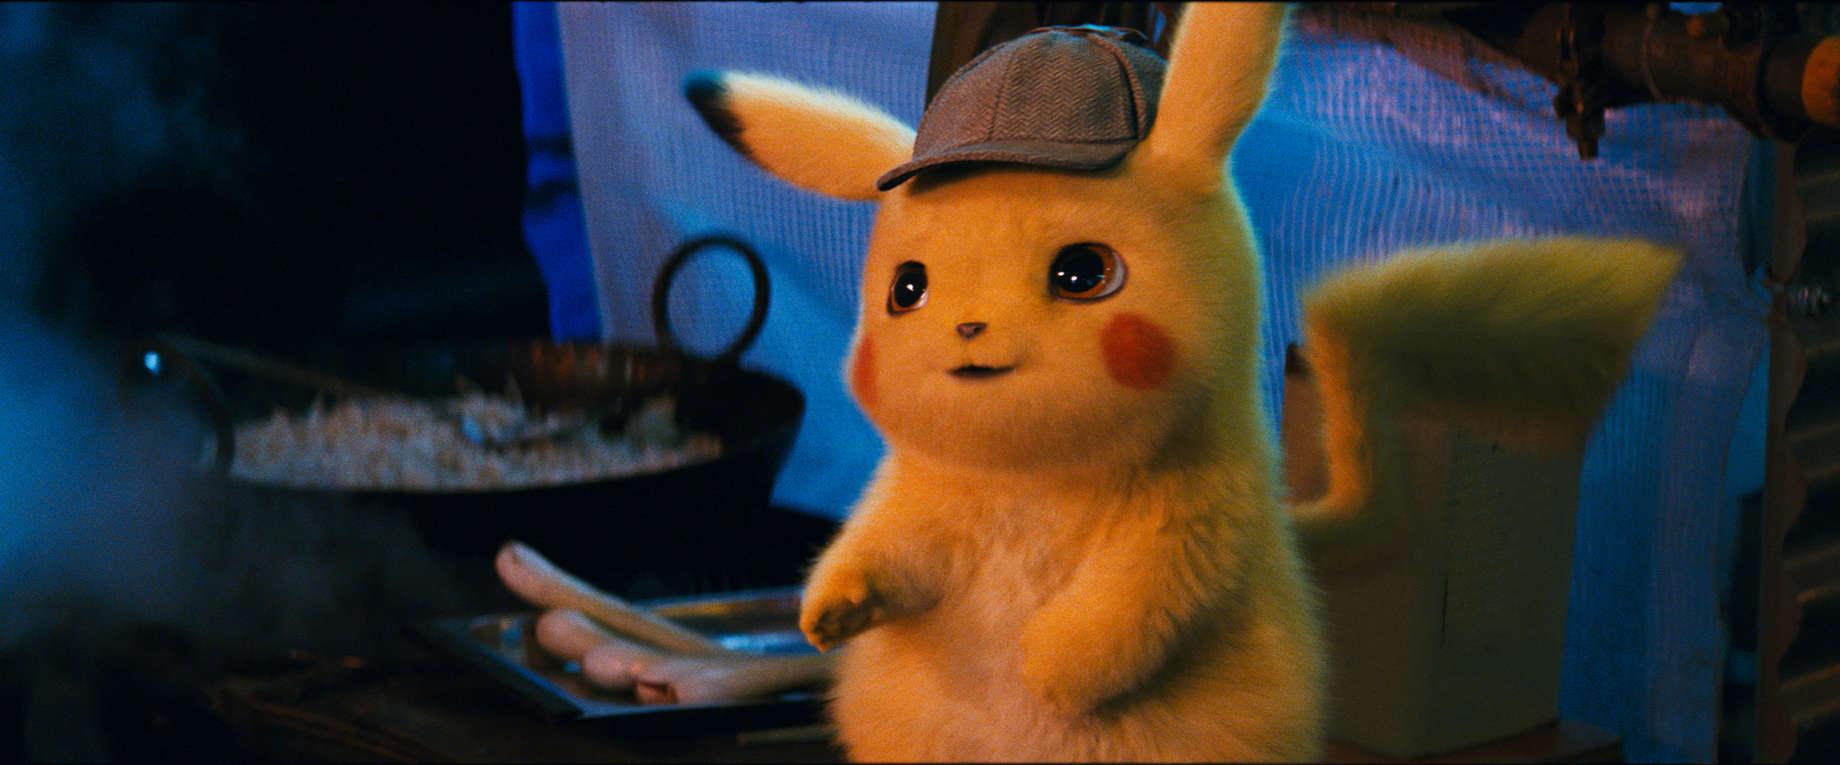 detective pikachu game tim